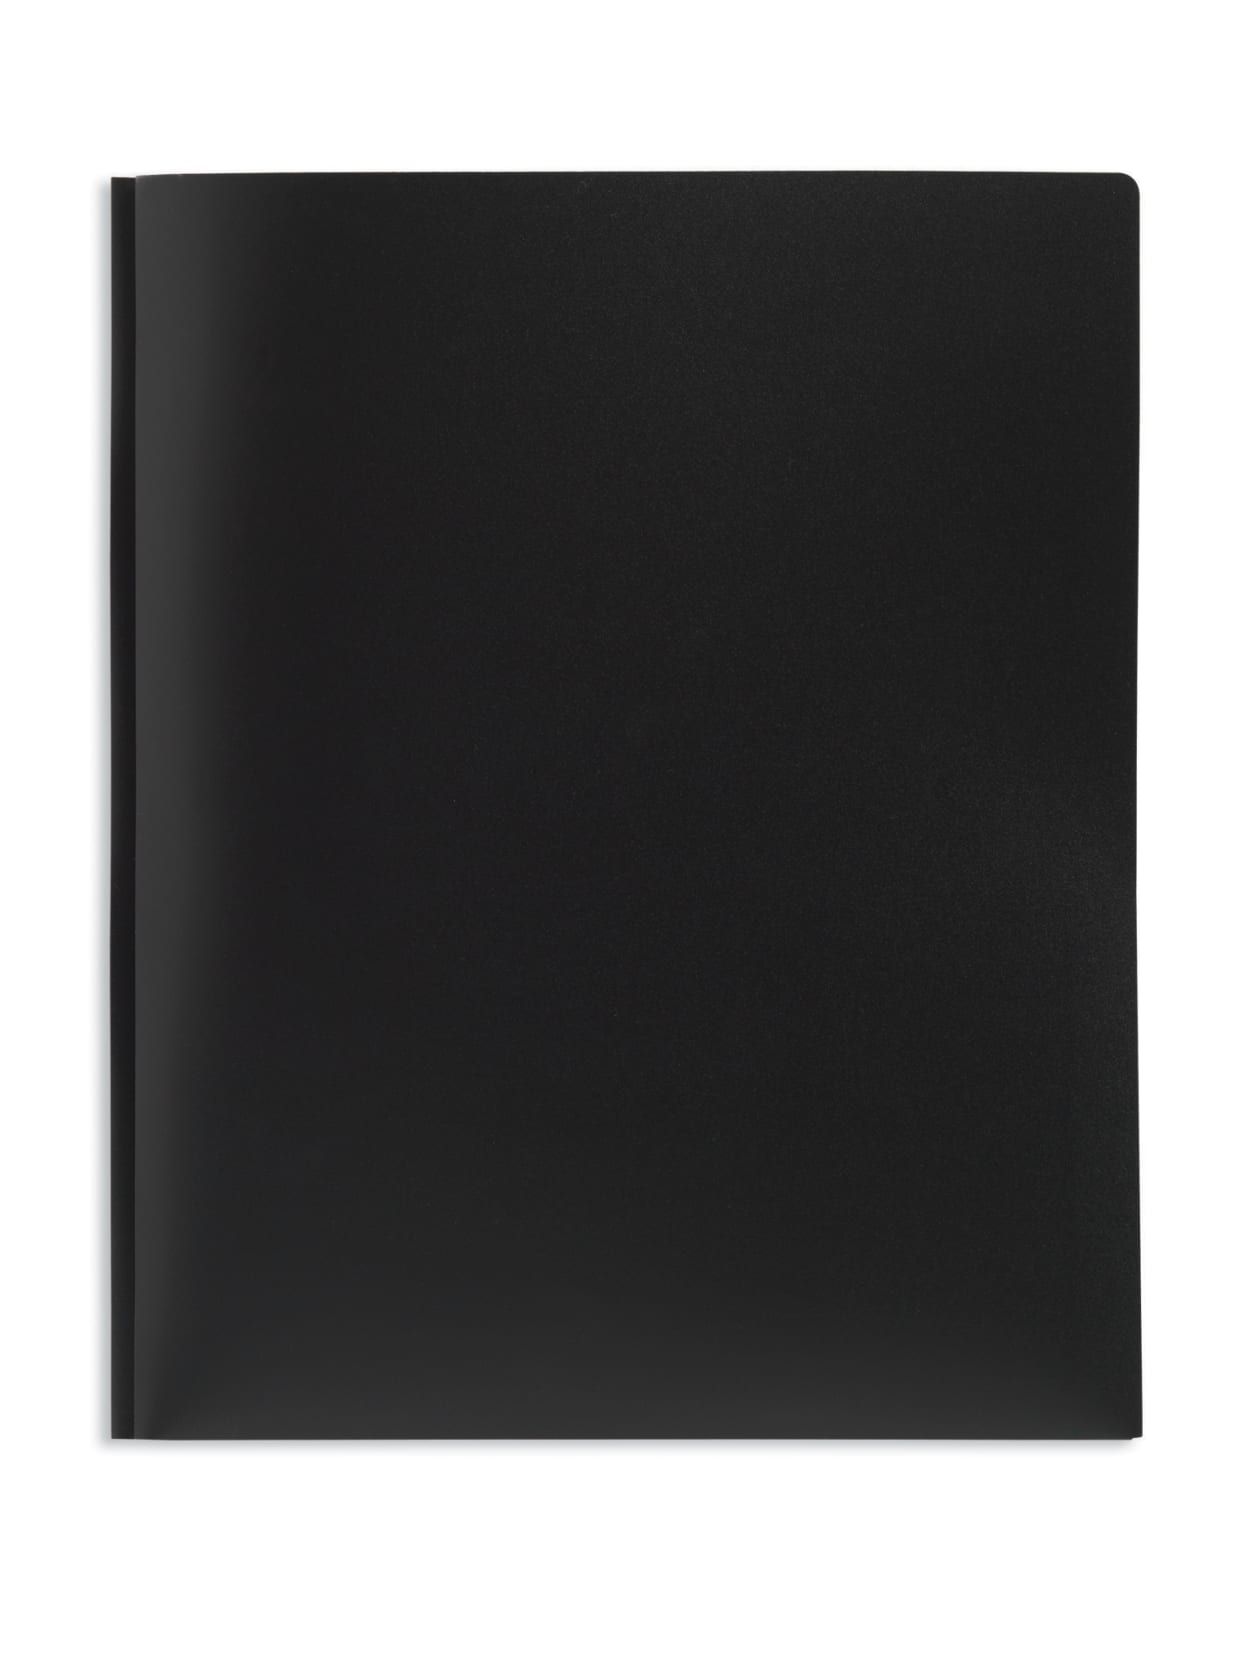 Lot of 6 Office Depot 2-Pocket Poly Portfolio Folder With Fasteners Black